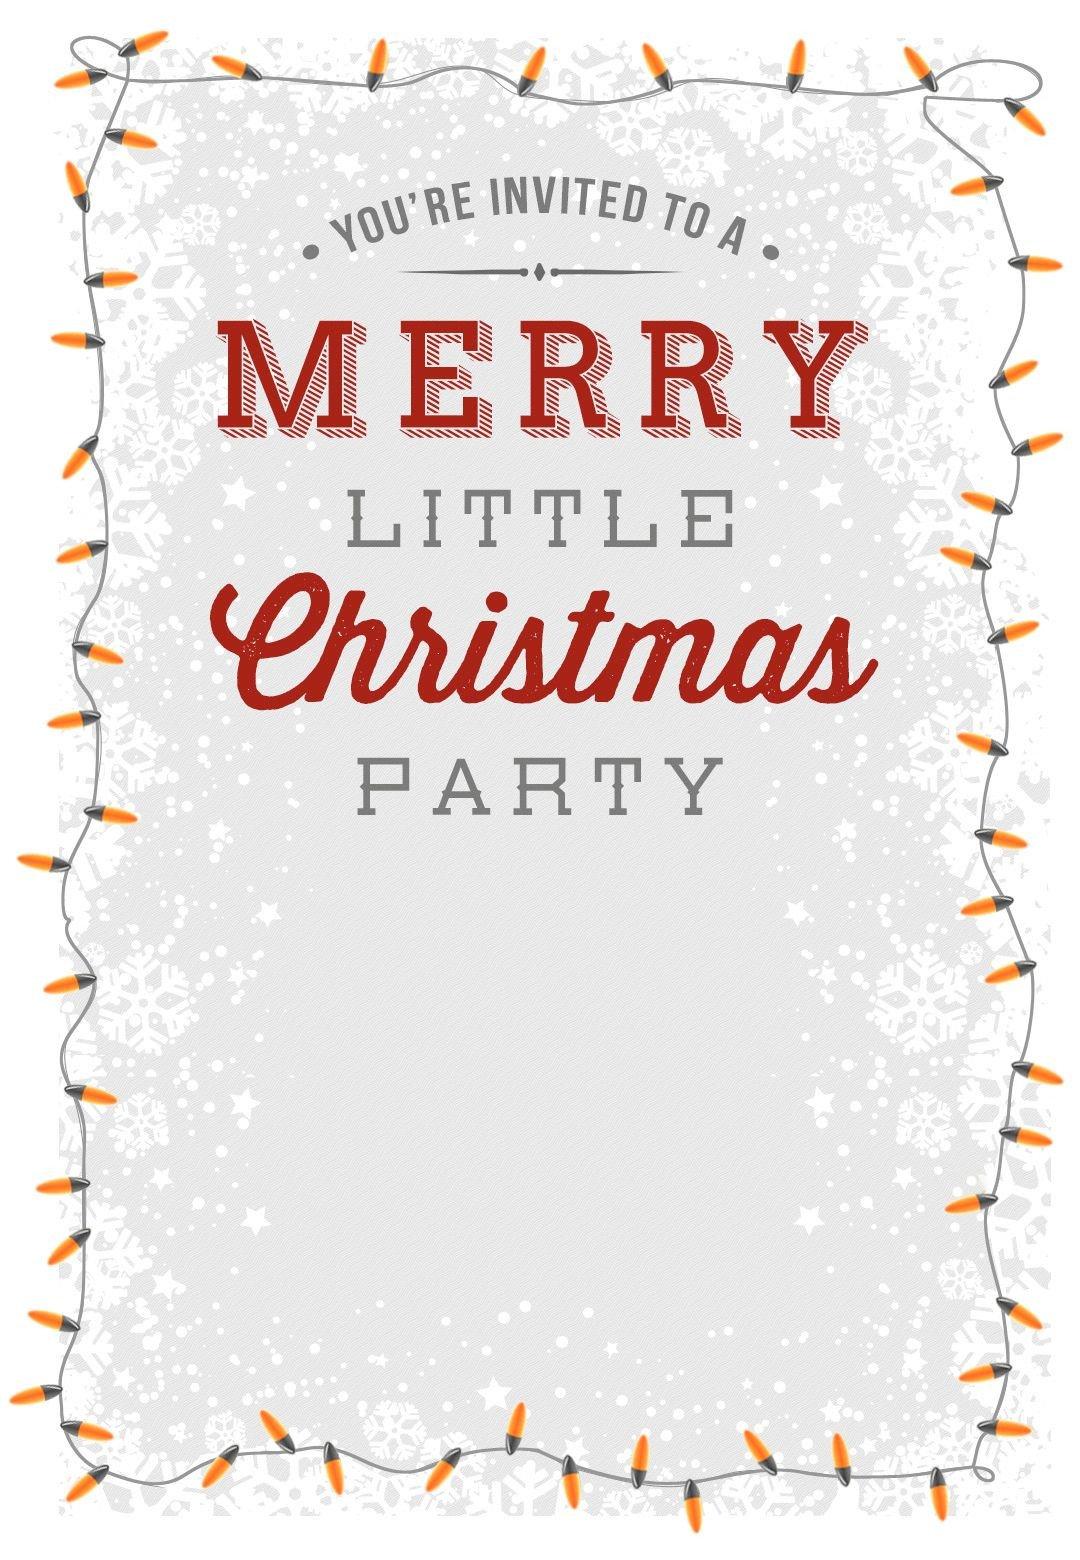 Free Printable Invitation Templates A Merry Little Party Free Printable Christmas Invitation